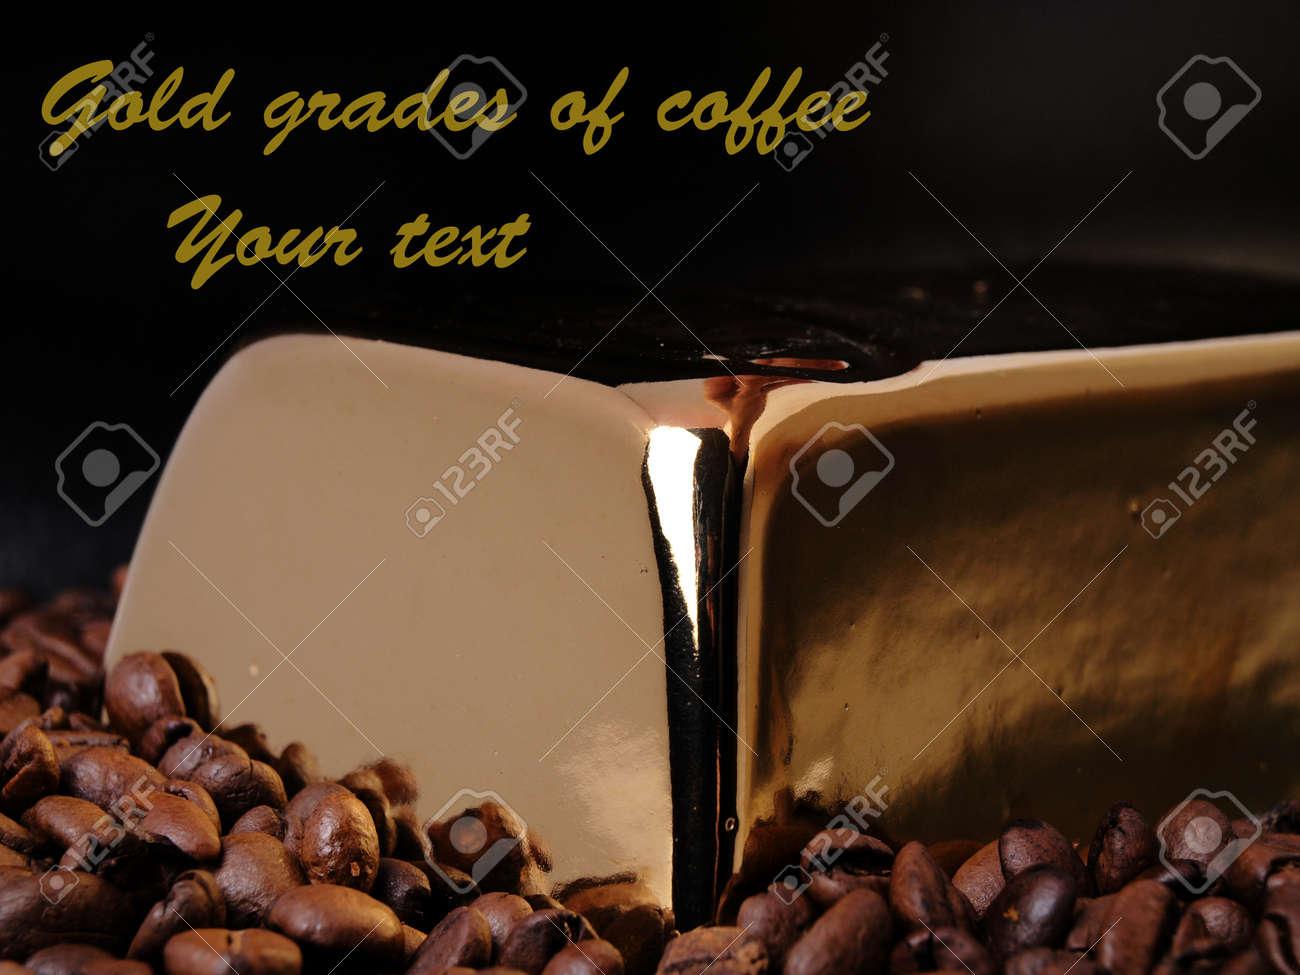 Gold grades of coffee Stock Photo - 12578659